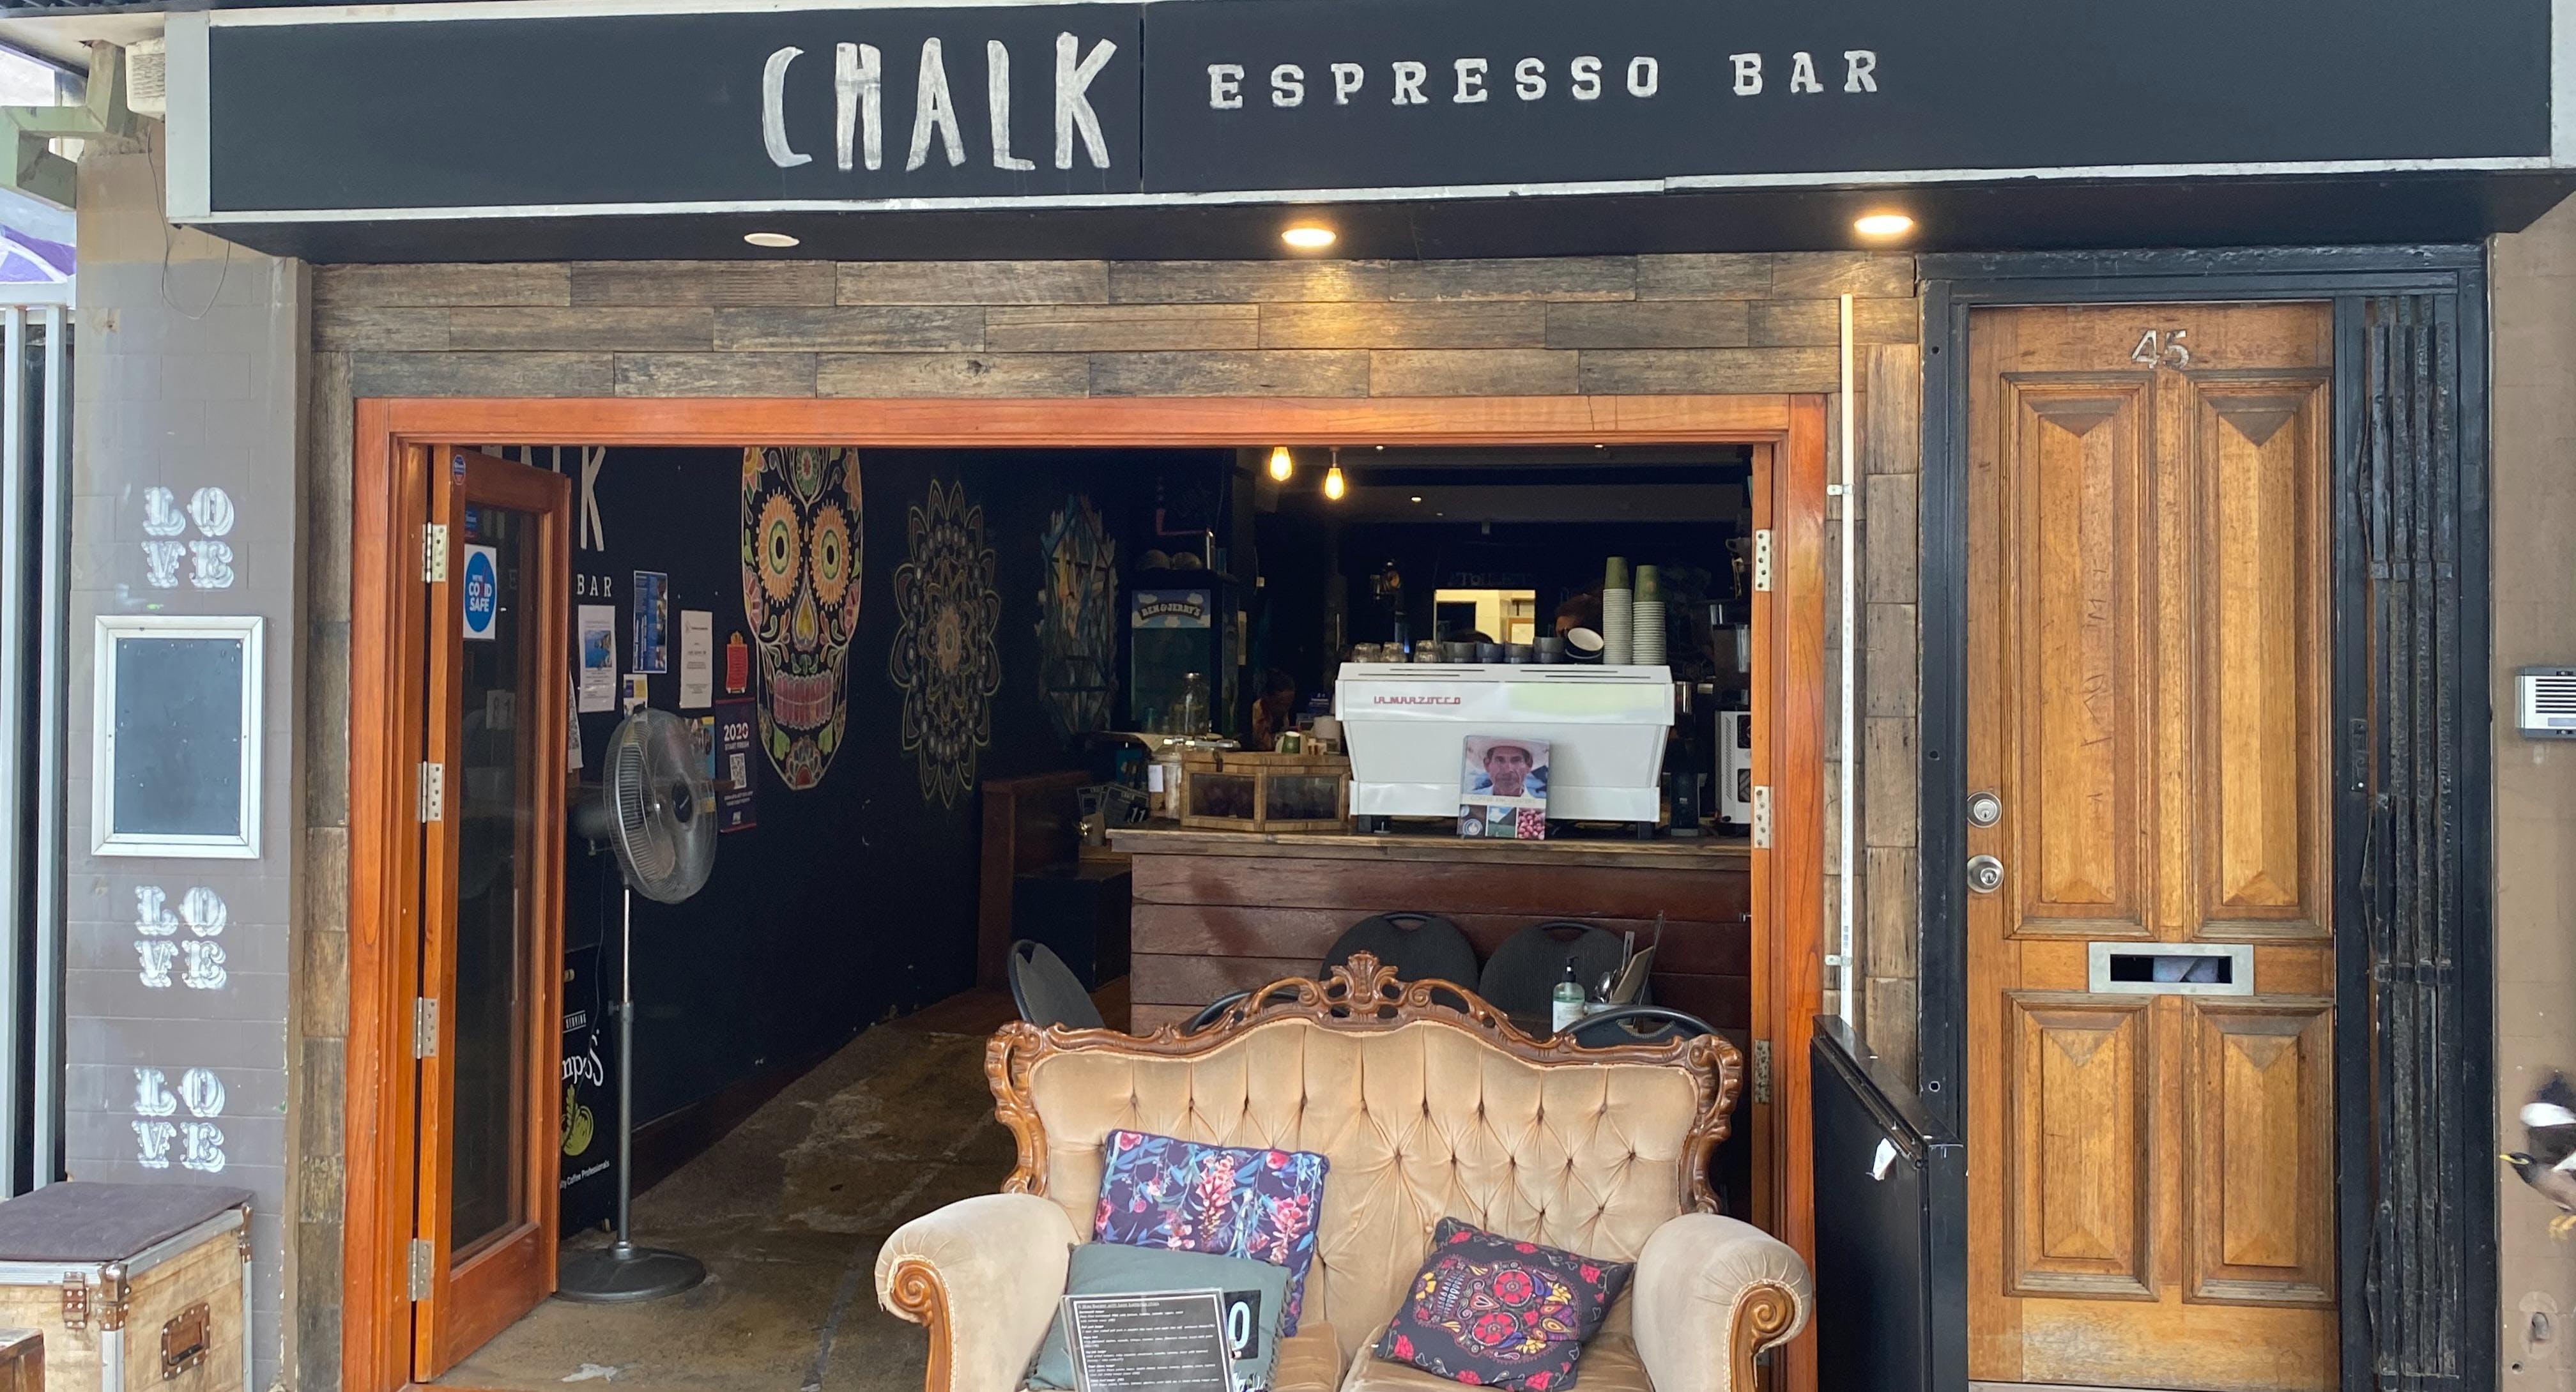 Photo of restaurant Chalk Espresso in Maroubra, Sydney